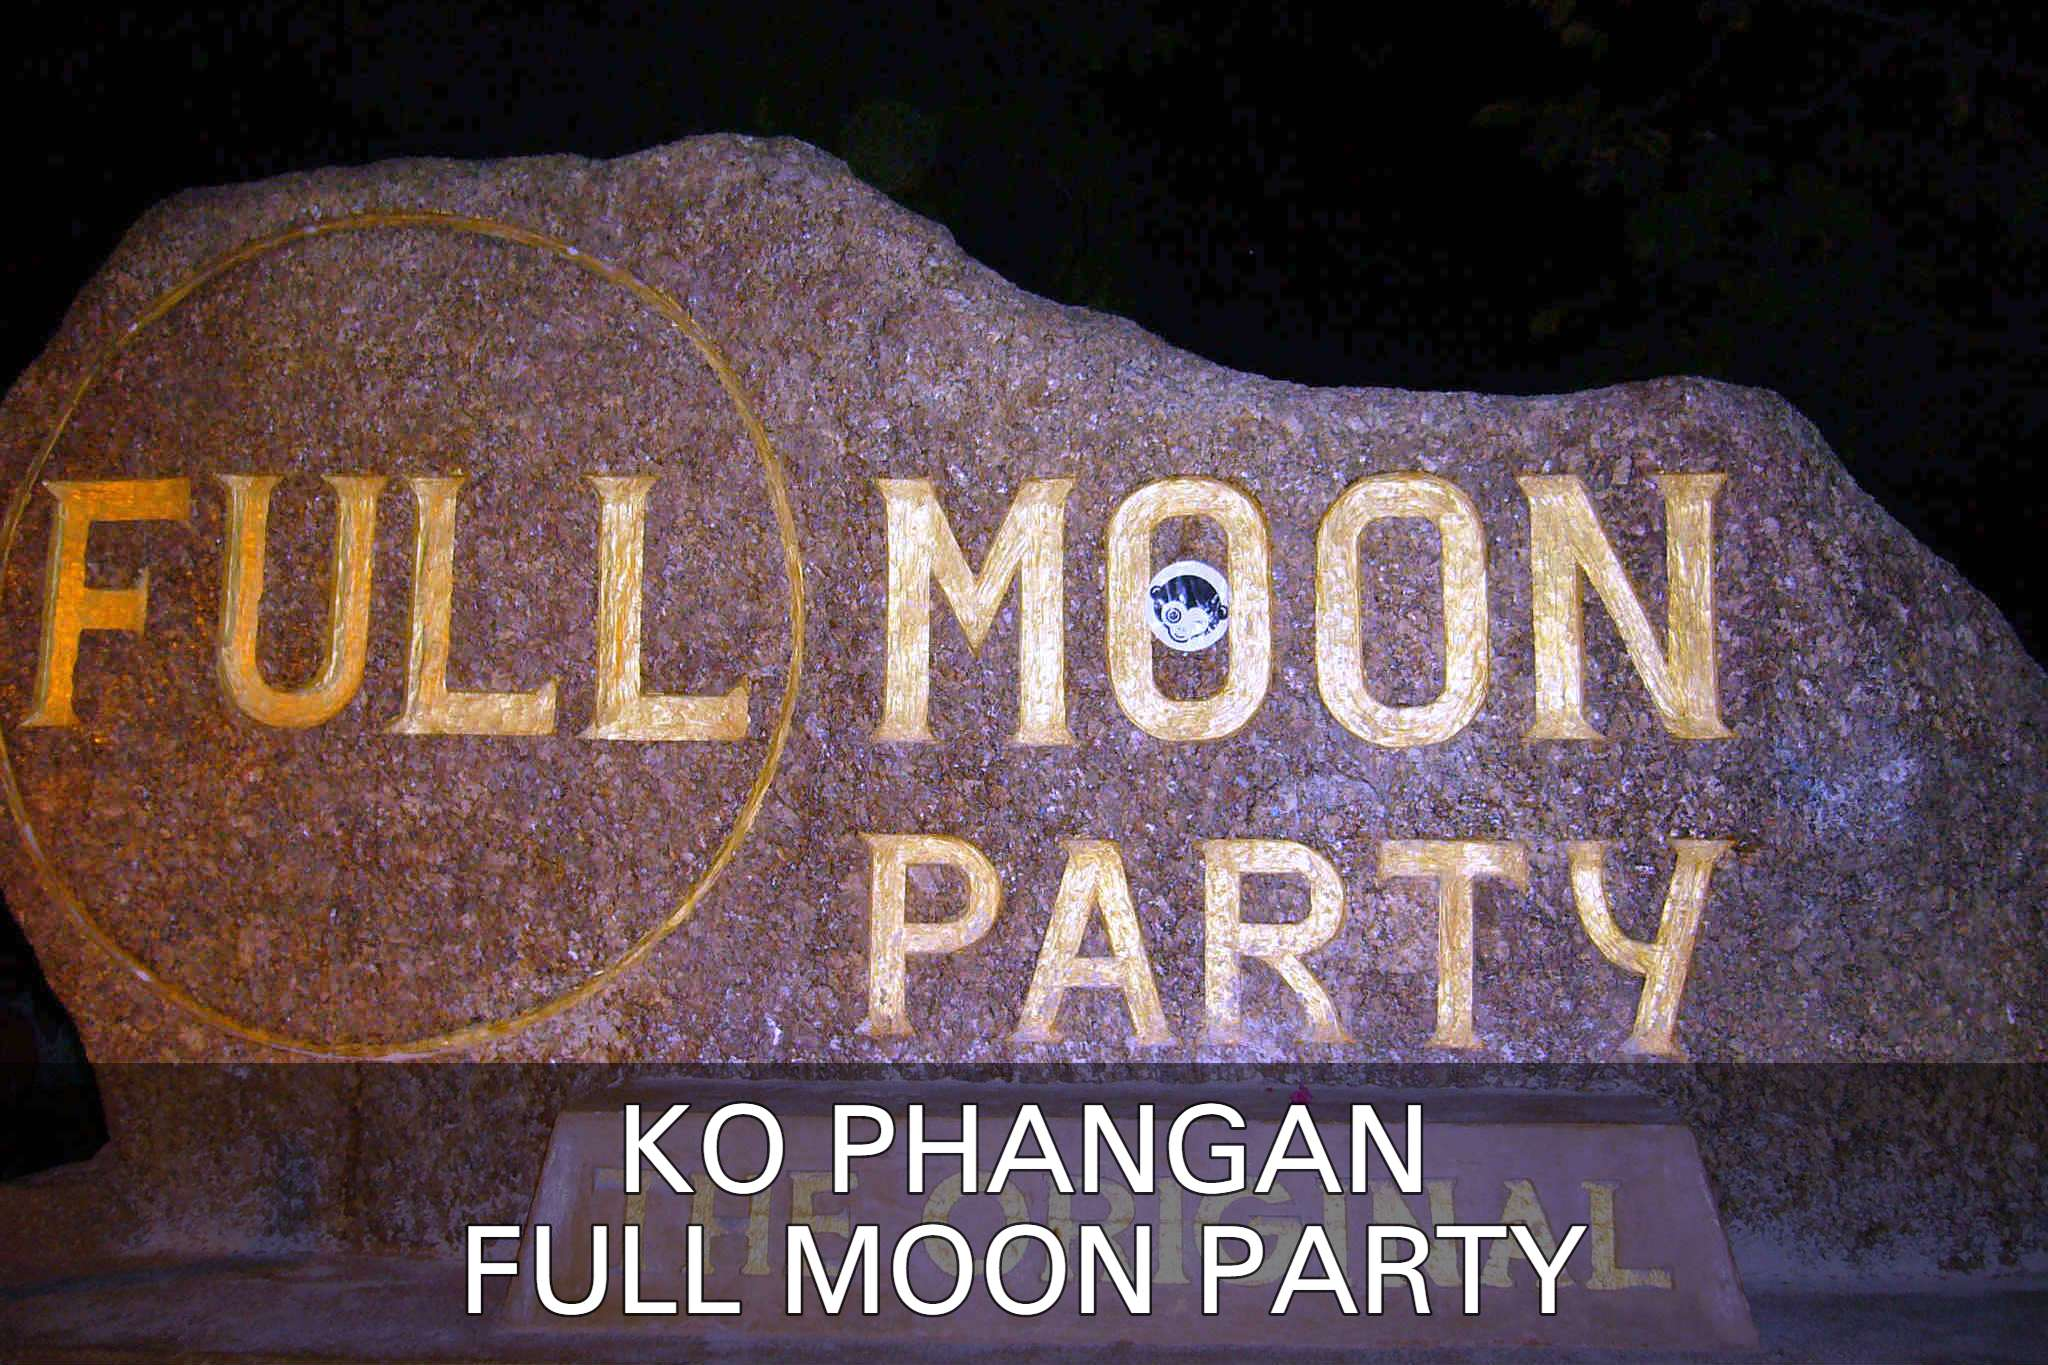 Full Moon Party At Haad Rin In Ko Phangan, Thailand